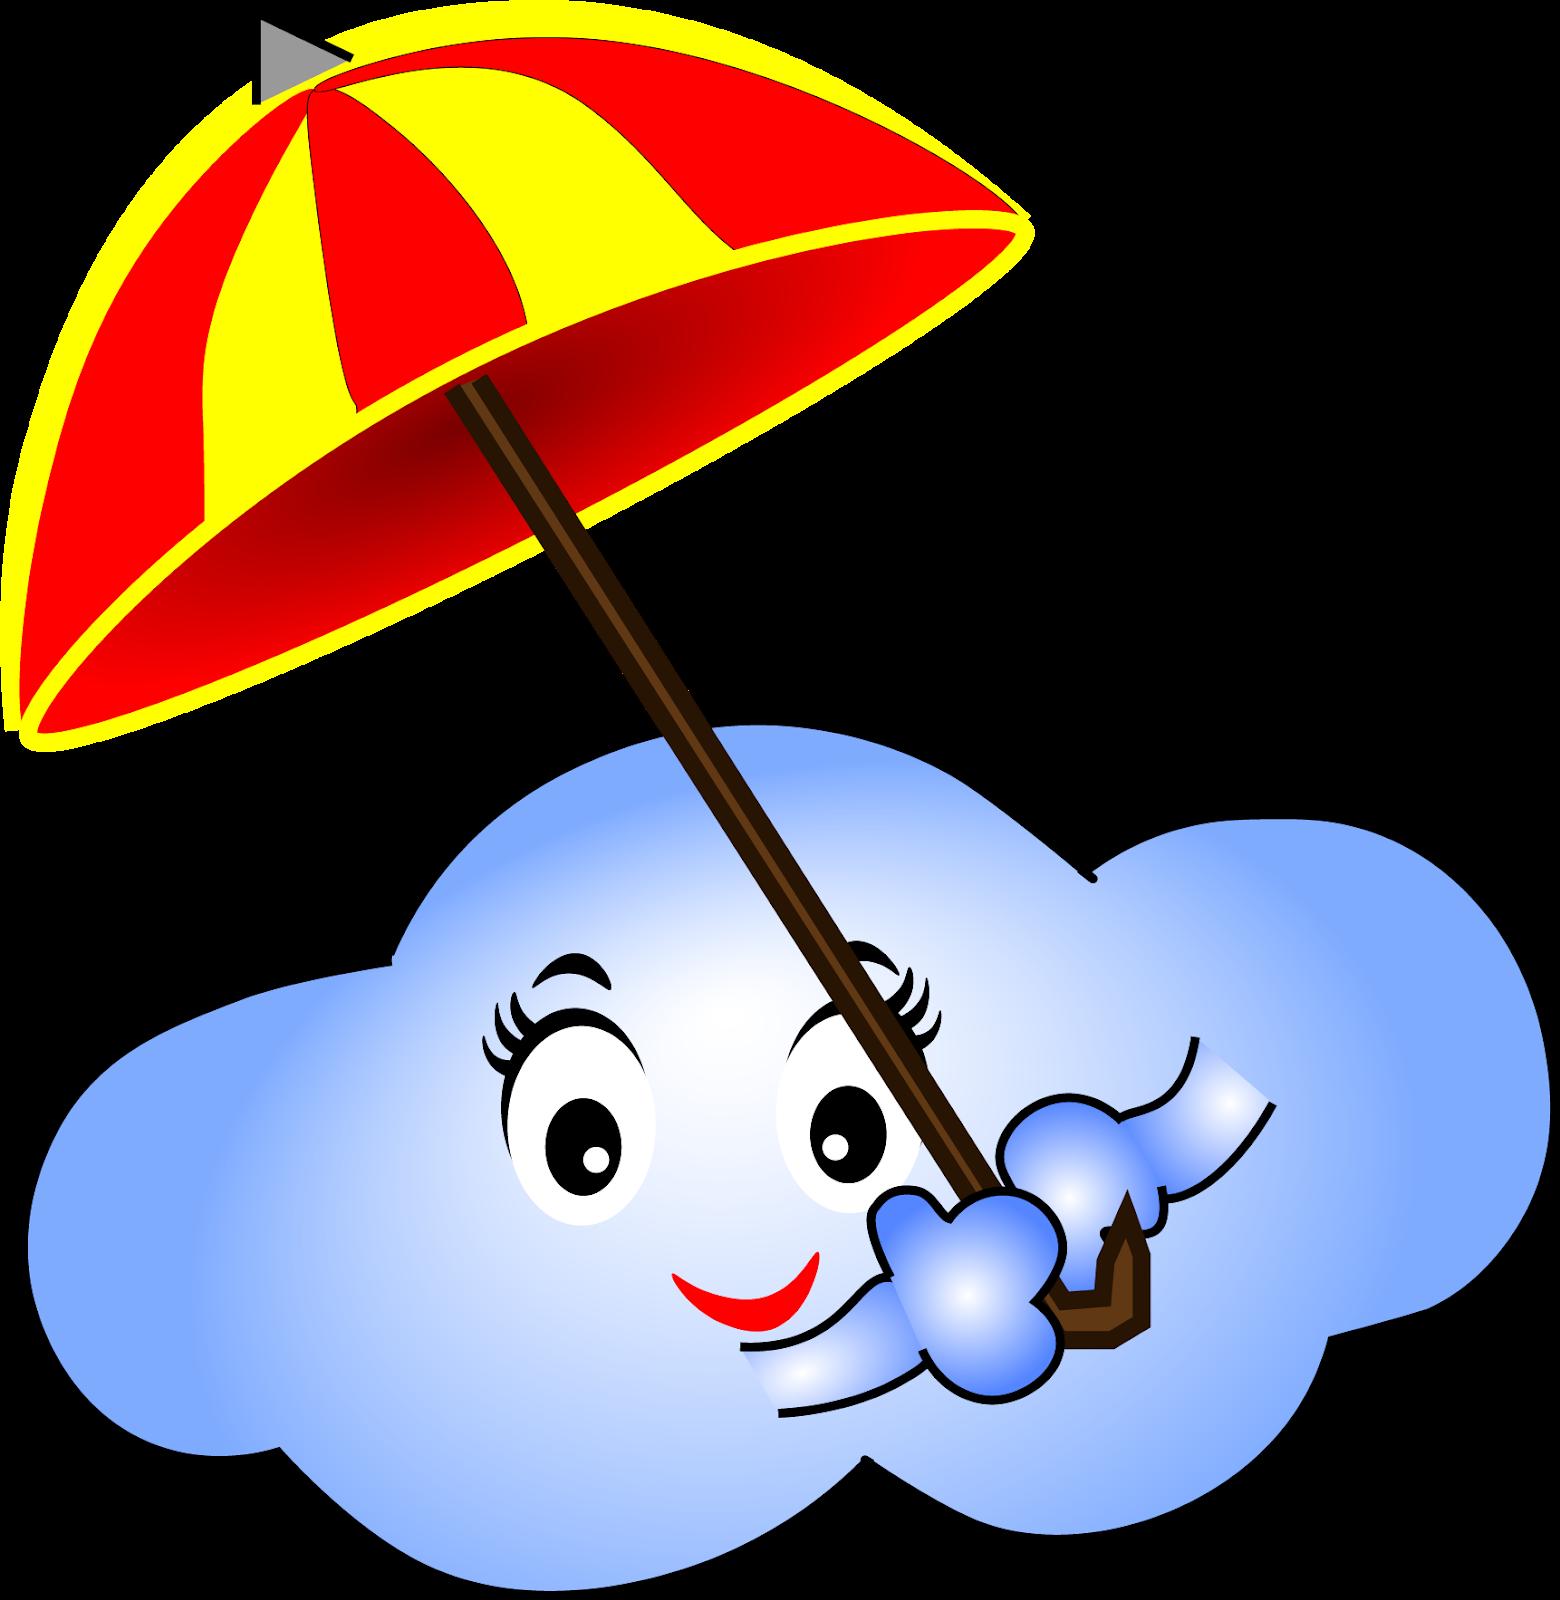 Best attitude clipart no background graphic free download Rain Cloud Clipart png Transparent Background | Graphics and Fiction graphic free download